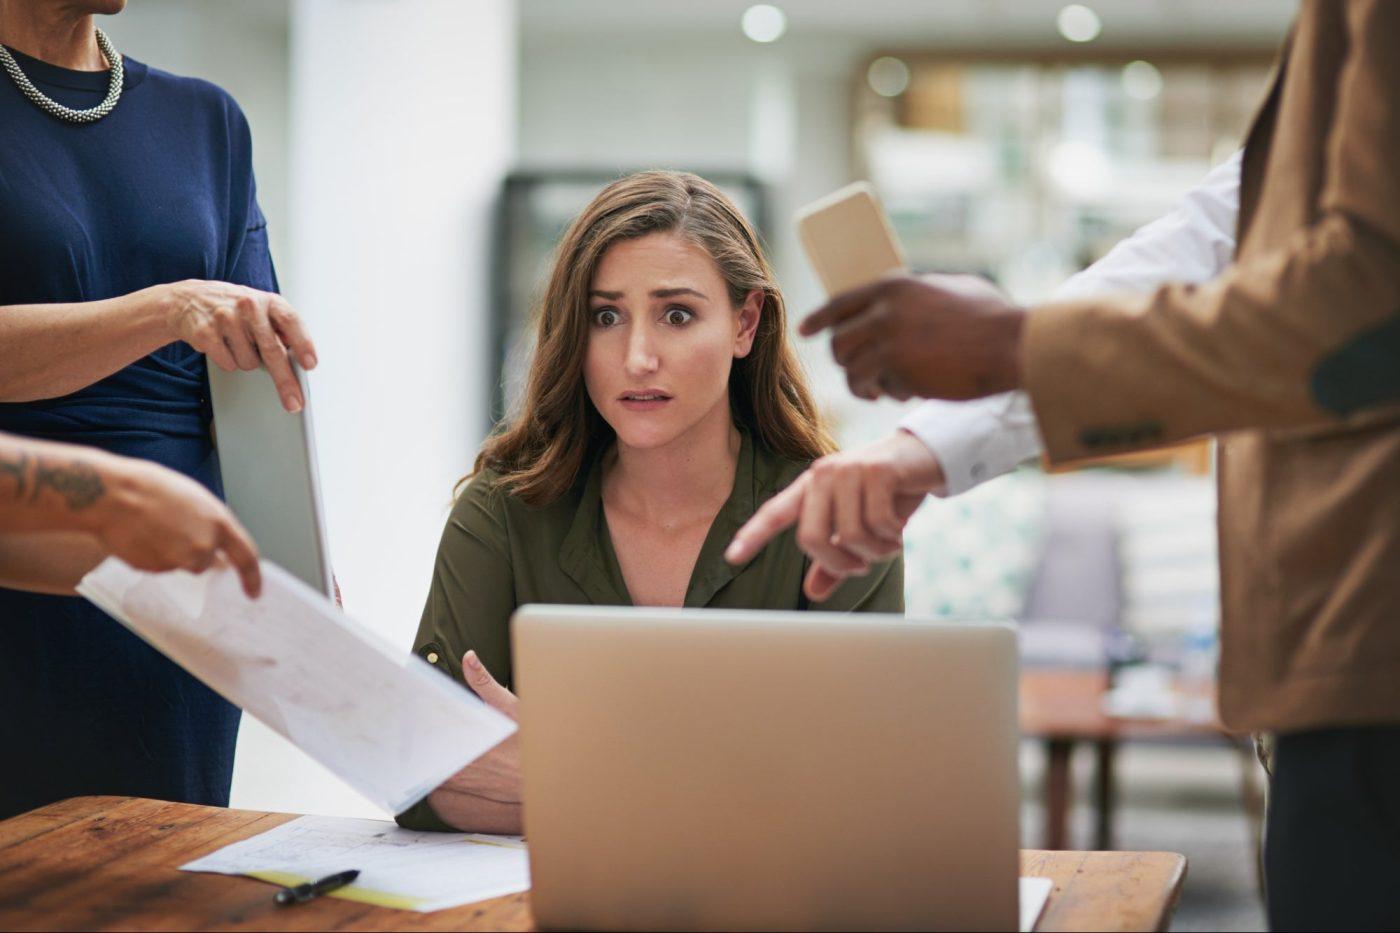 How to Set Boundaries as an Entrepreneur